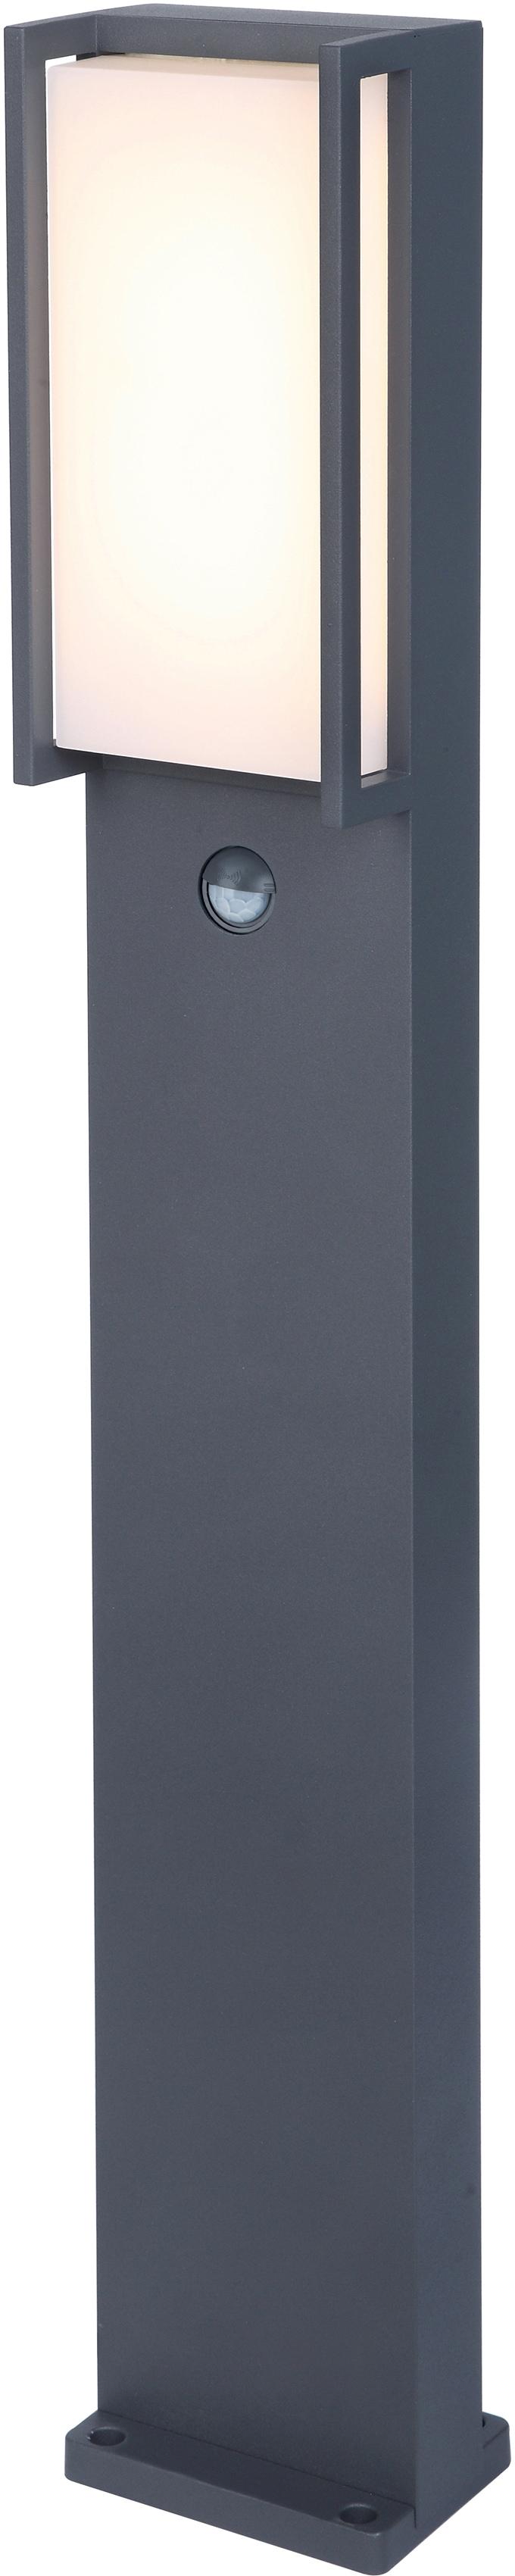 LUTEC LED Pollerleuchte QUBO 7193004118, LED-Modul, 1 St., Warmweiß